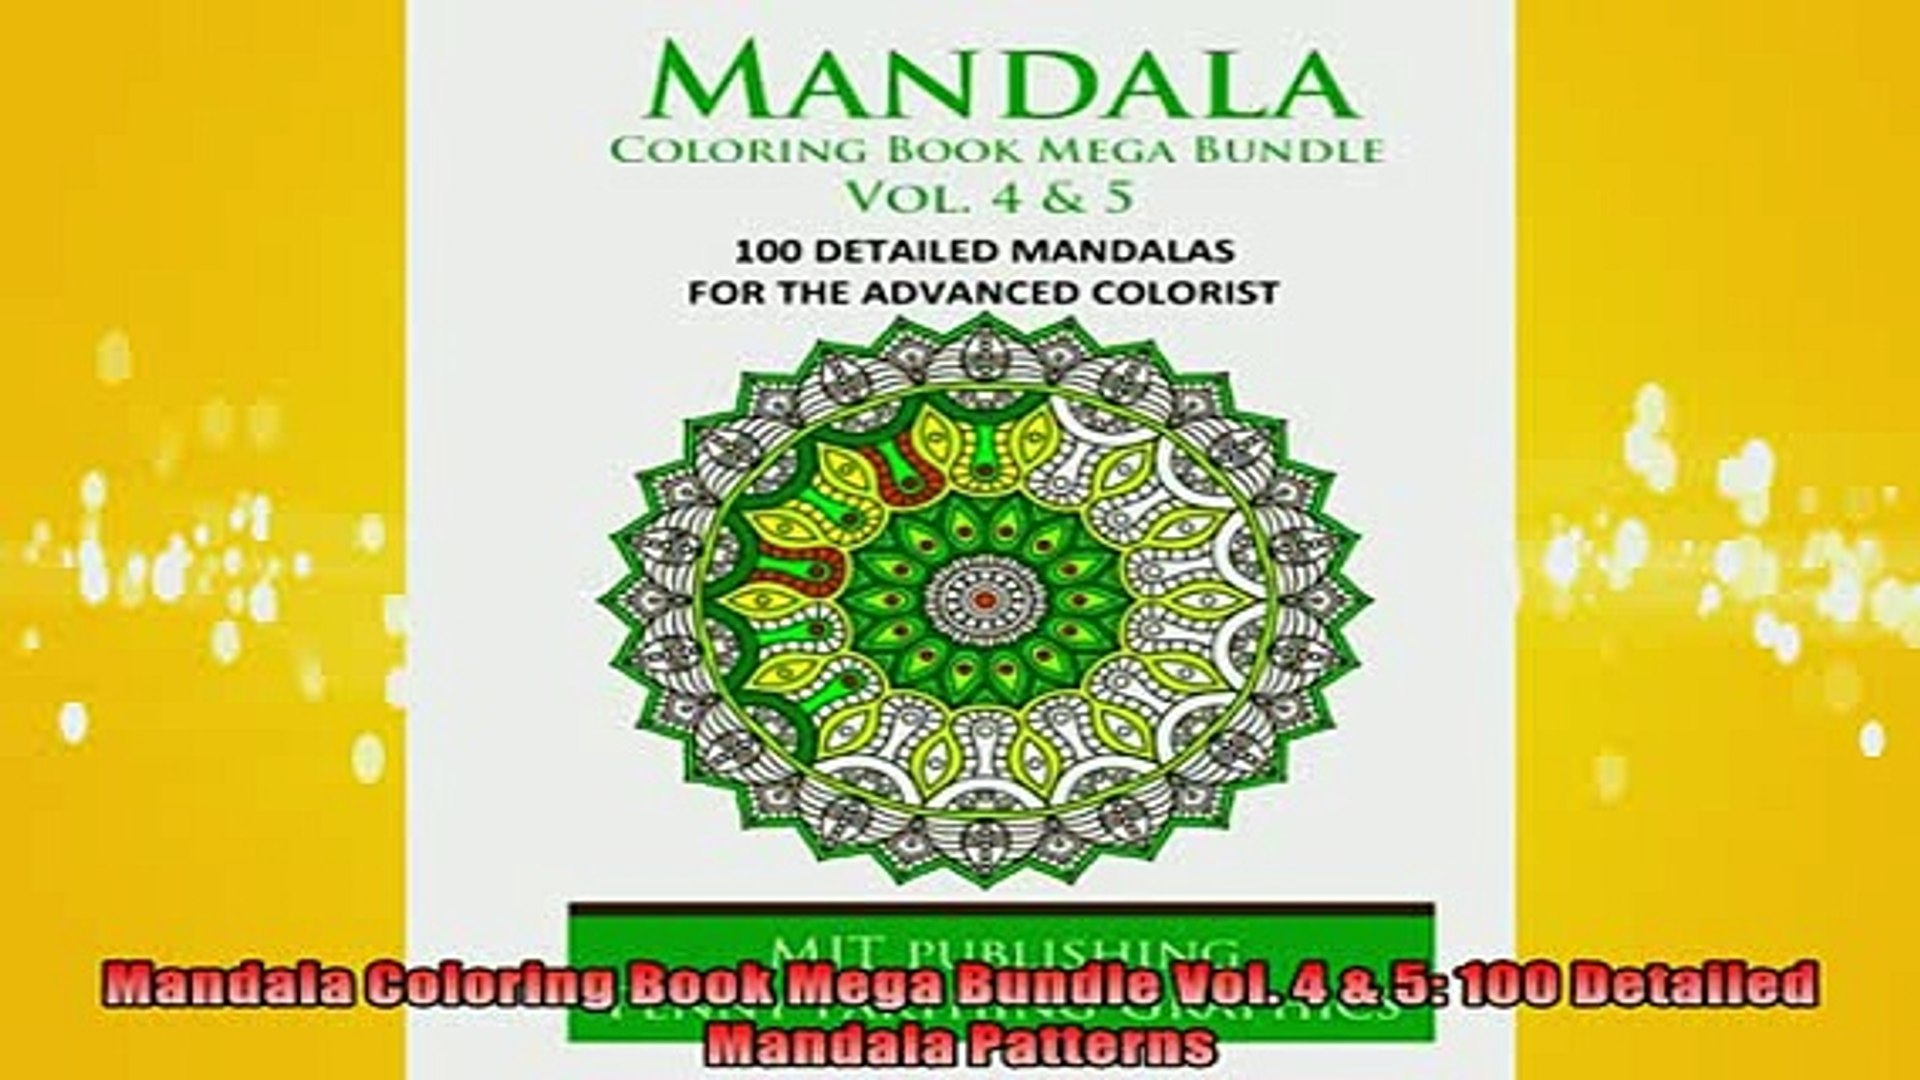 - EBOOK ONLINE Mandala Coloring Book Mega Bundle Vol 4 5 100